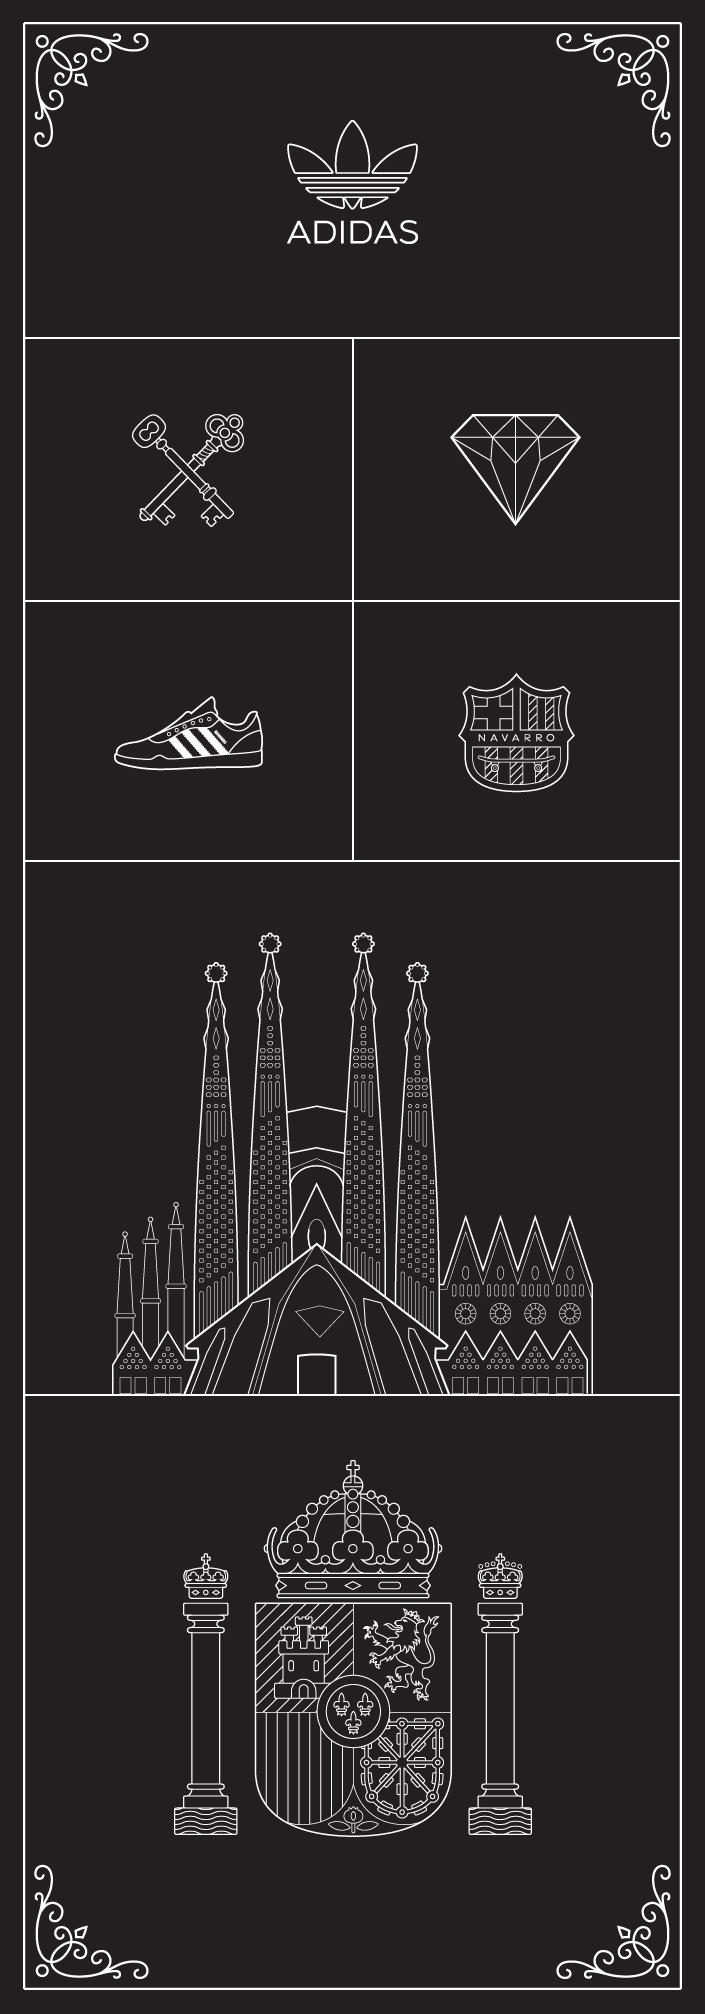 Adidas_RaulNavarro_LineArt_1